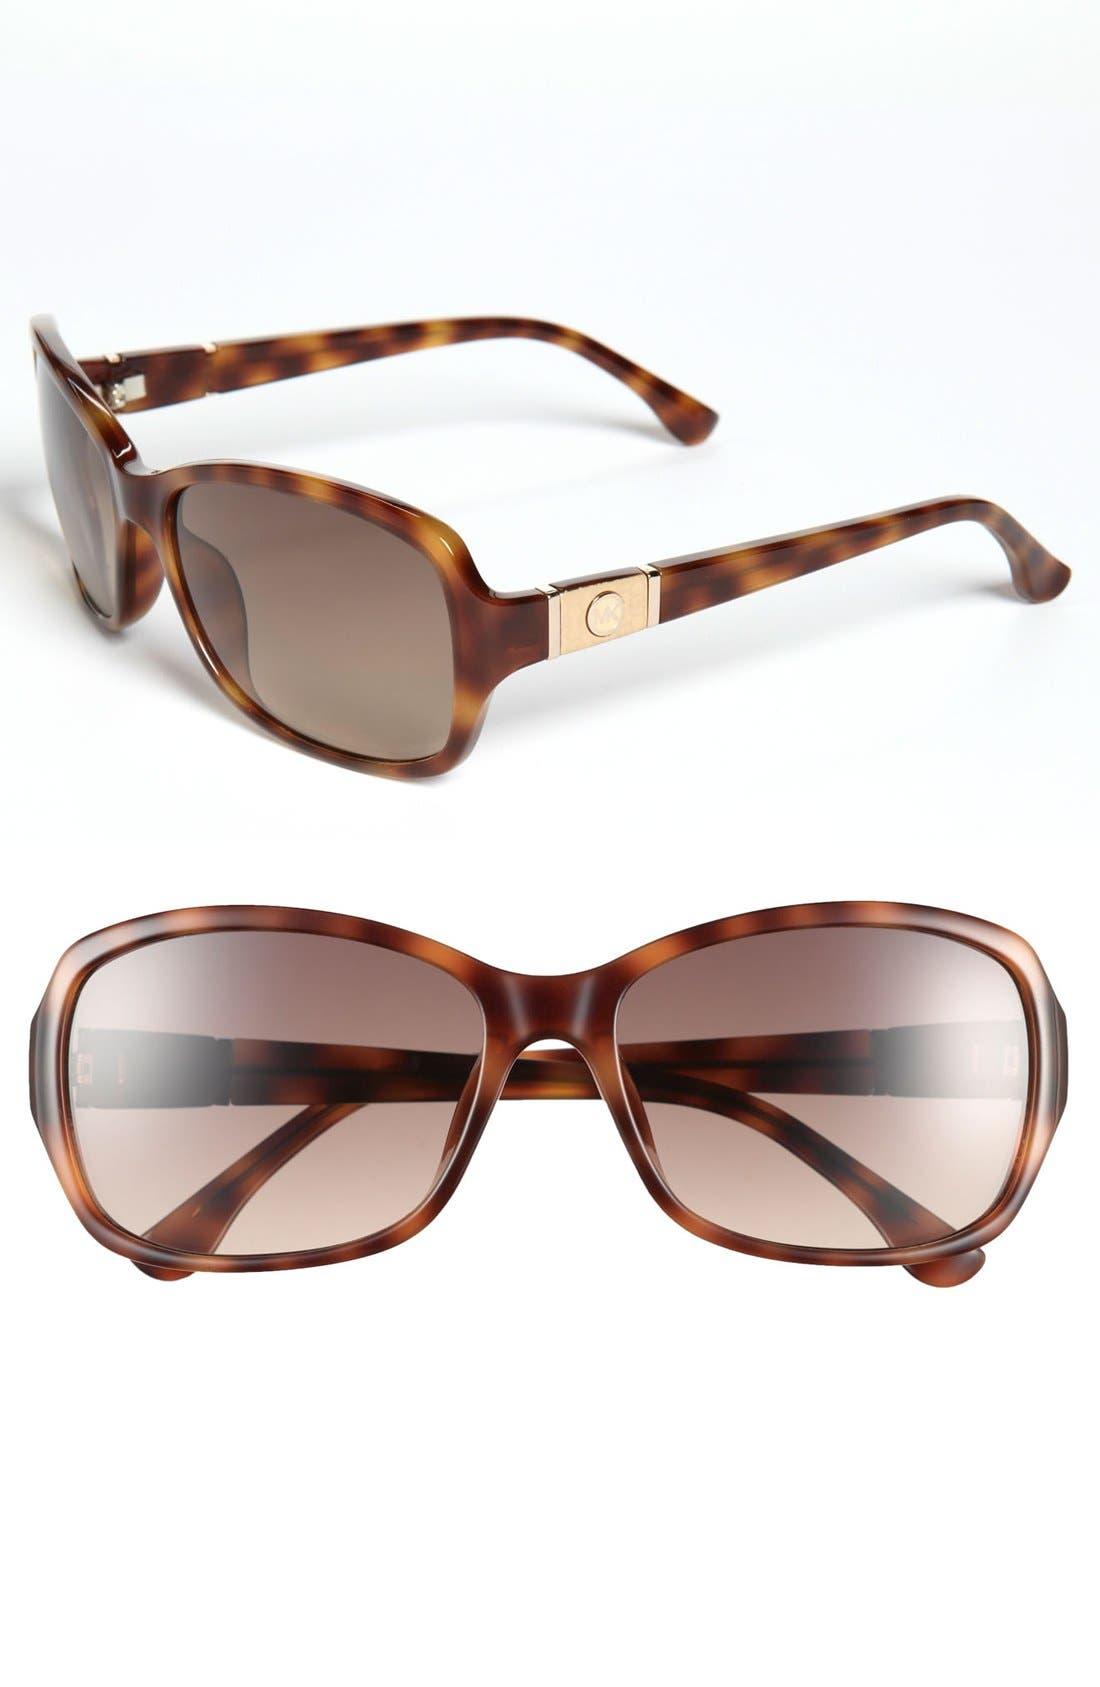 Alternate Image 1 Selected - MICHAEL Michael Kors 'Kayla' 57mm Sunglasses